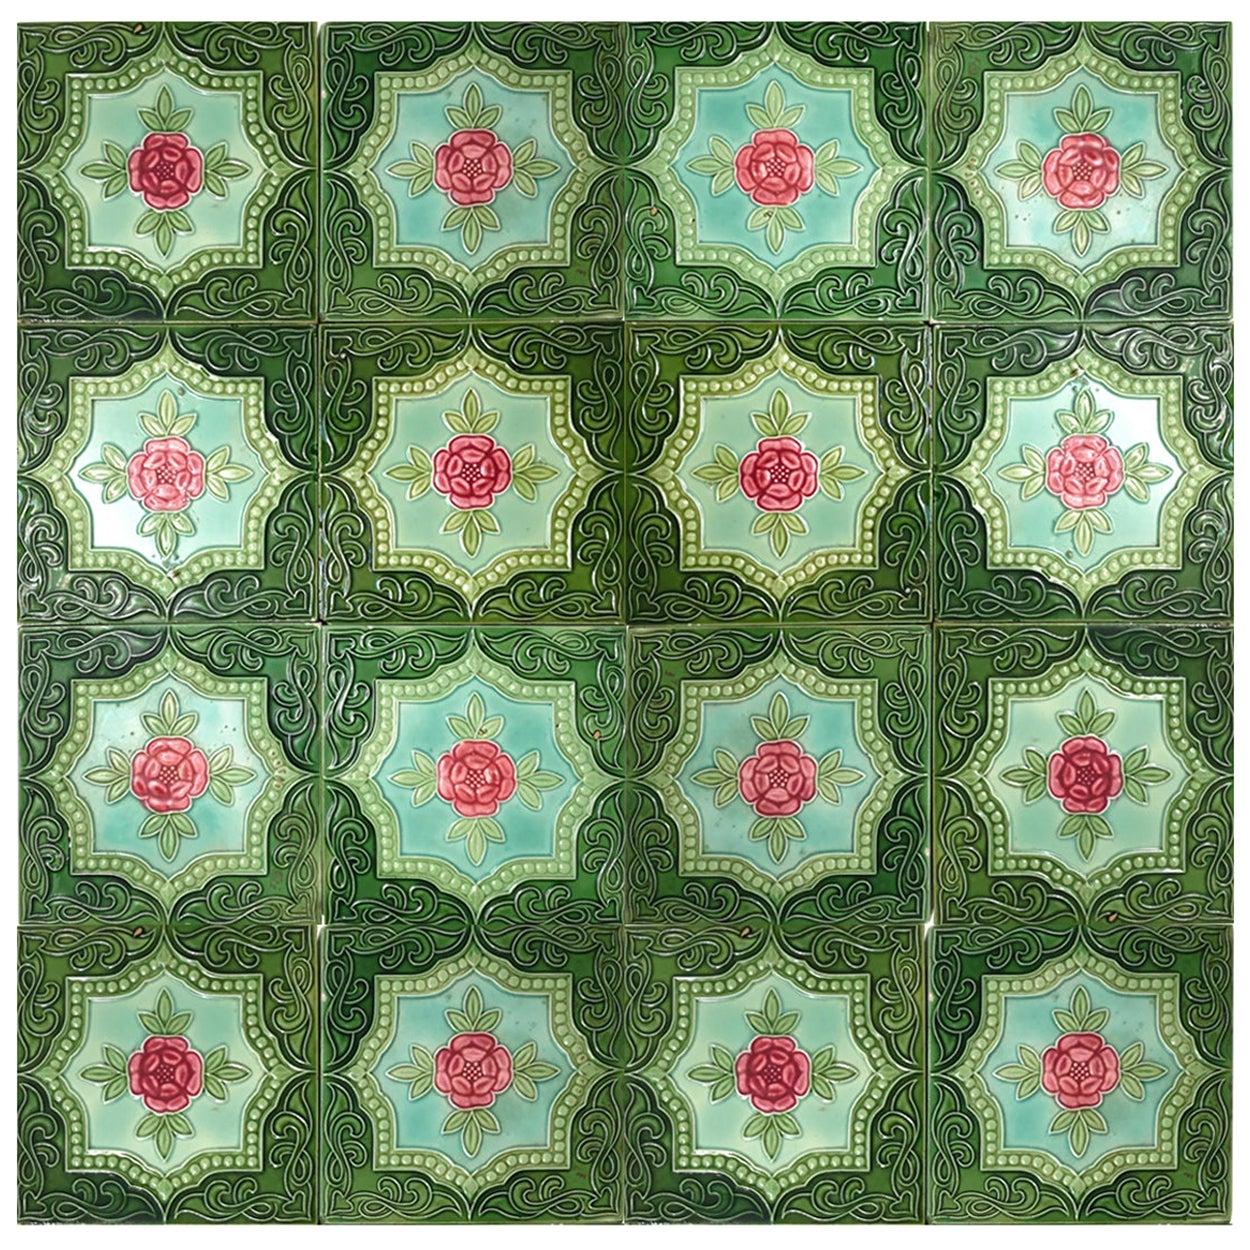 One of the 20 Authentic Glazed Art Nouveau Relief Tiles Rose, Belga, circa 1930s